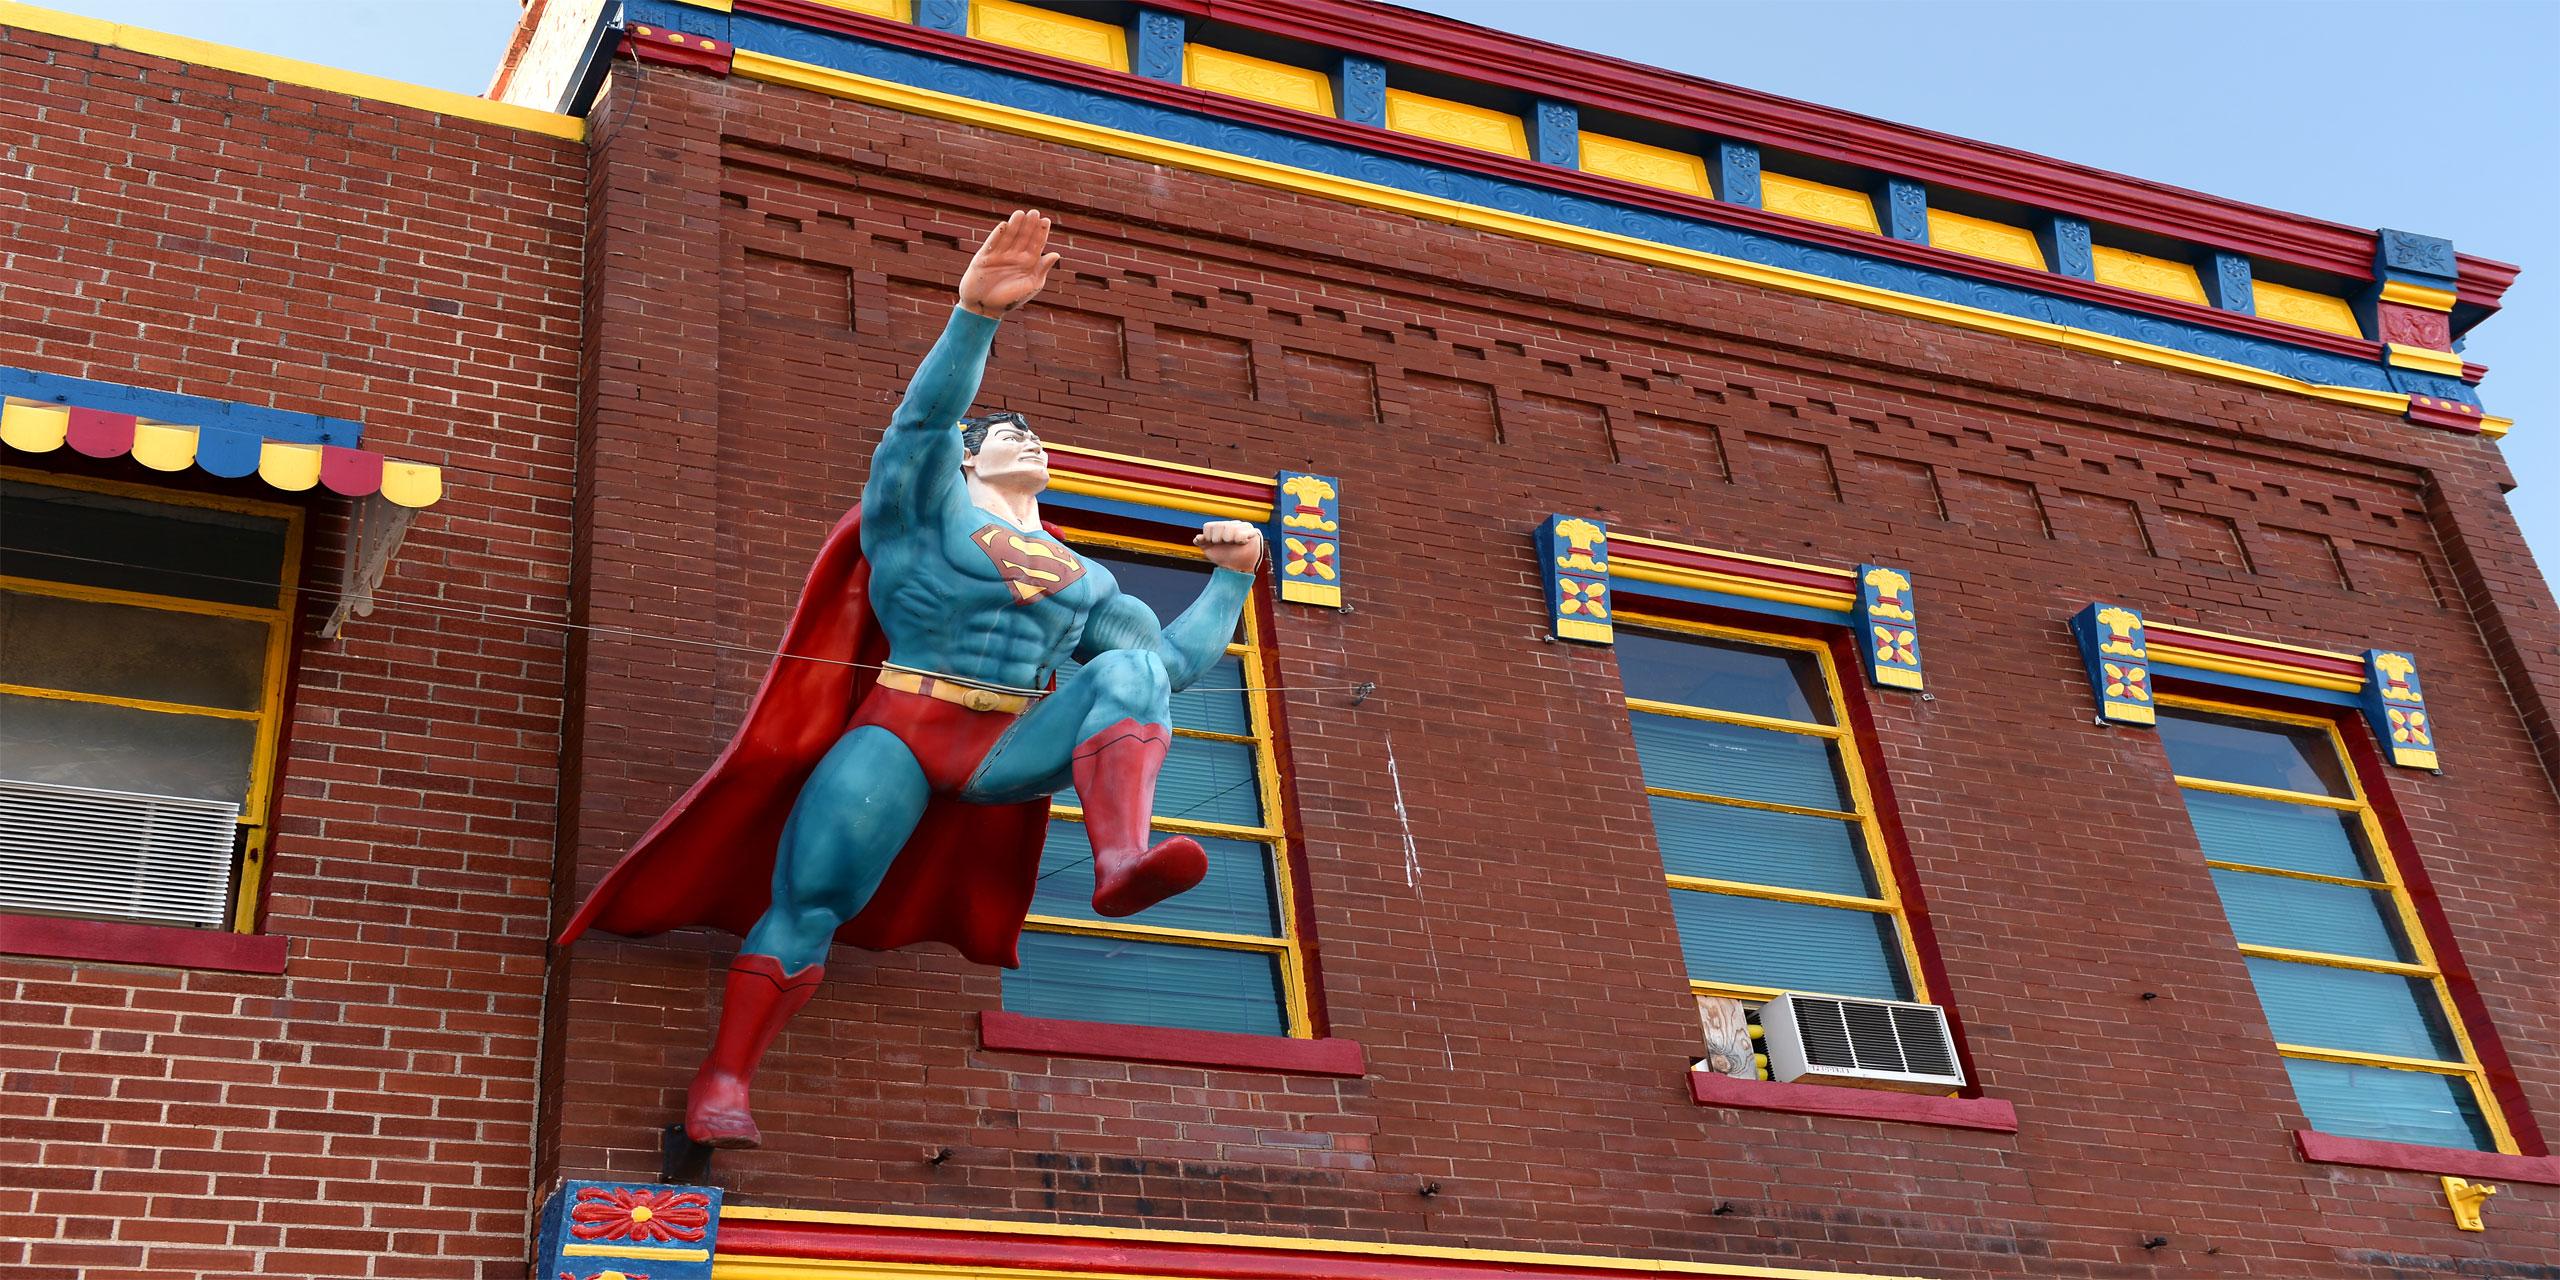 Metroplois, Illinois; Courtesy of Gino Santa Maria/Shutterstock.com